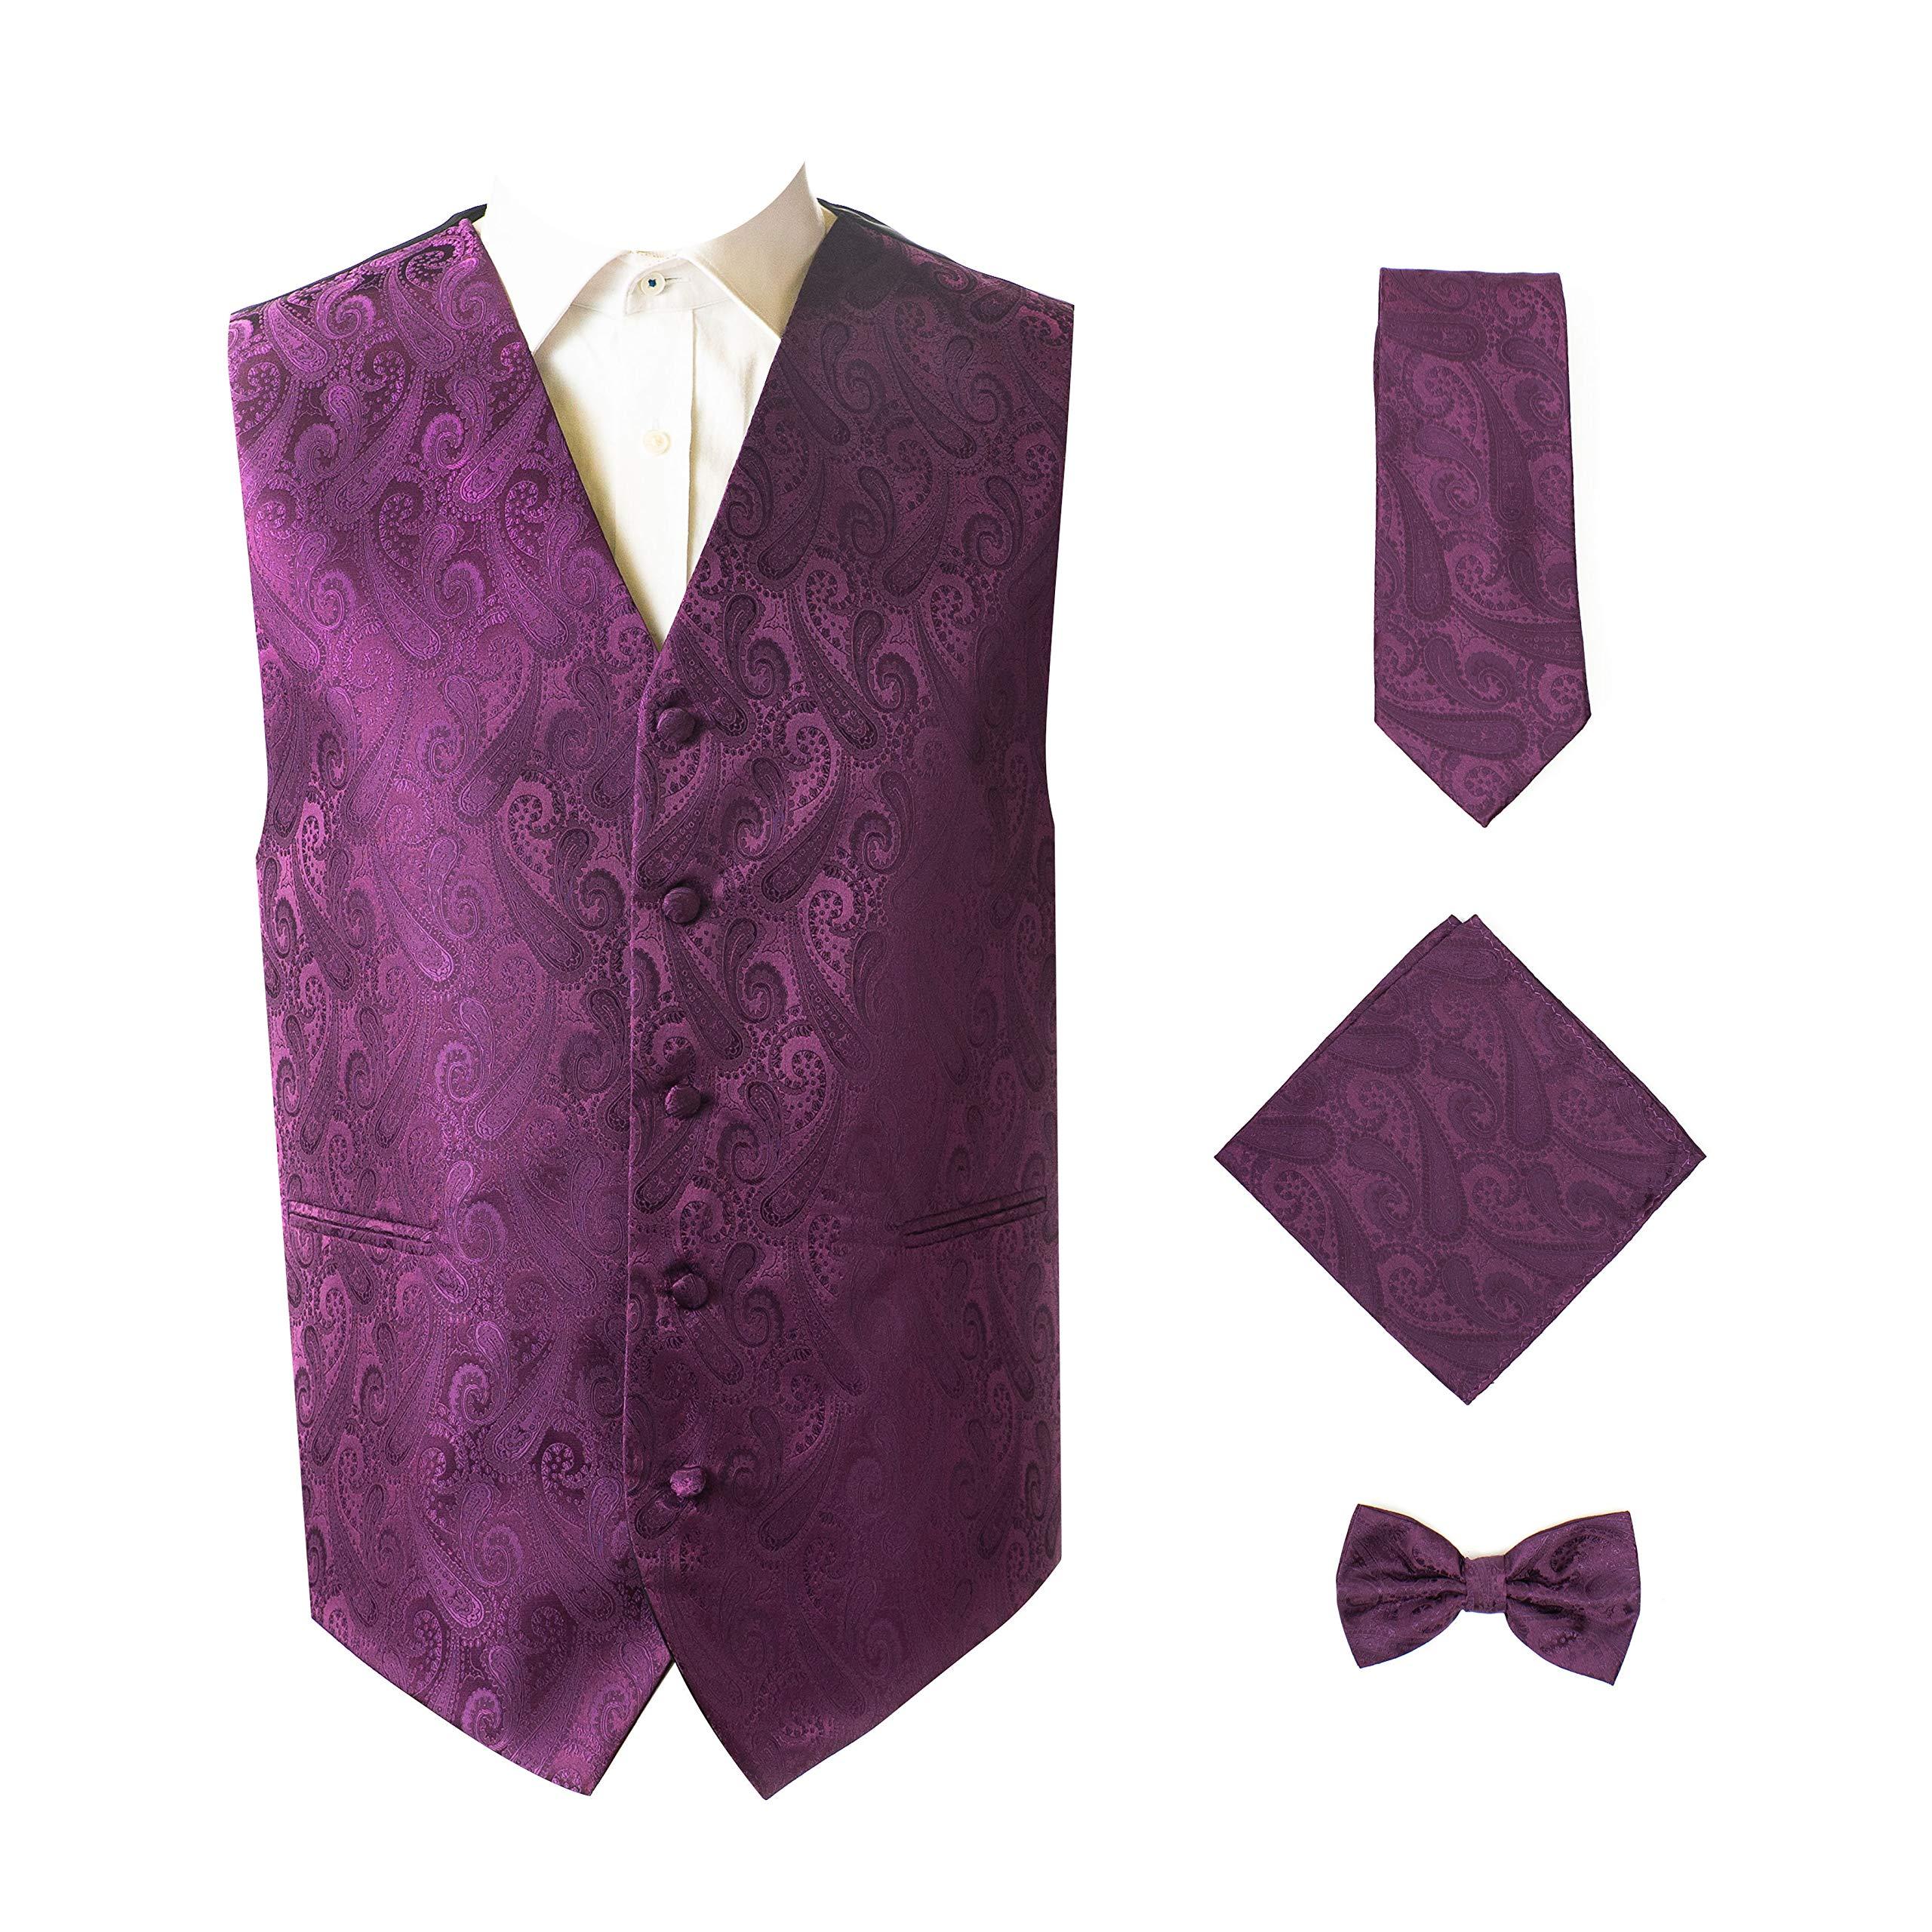 4pc Paisley Vest Set-Dark Purple-M by Oliver George